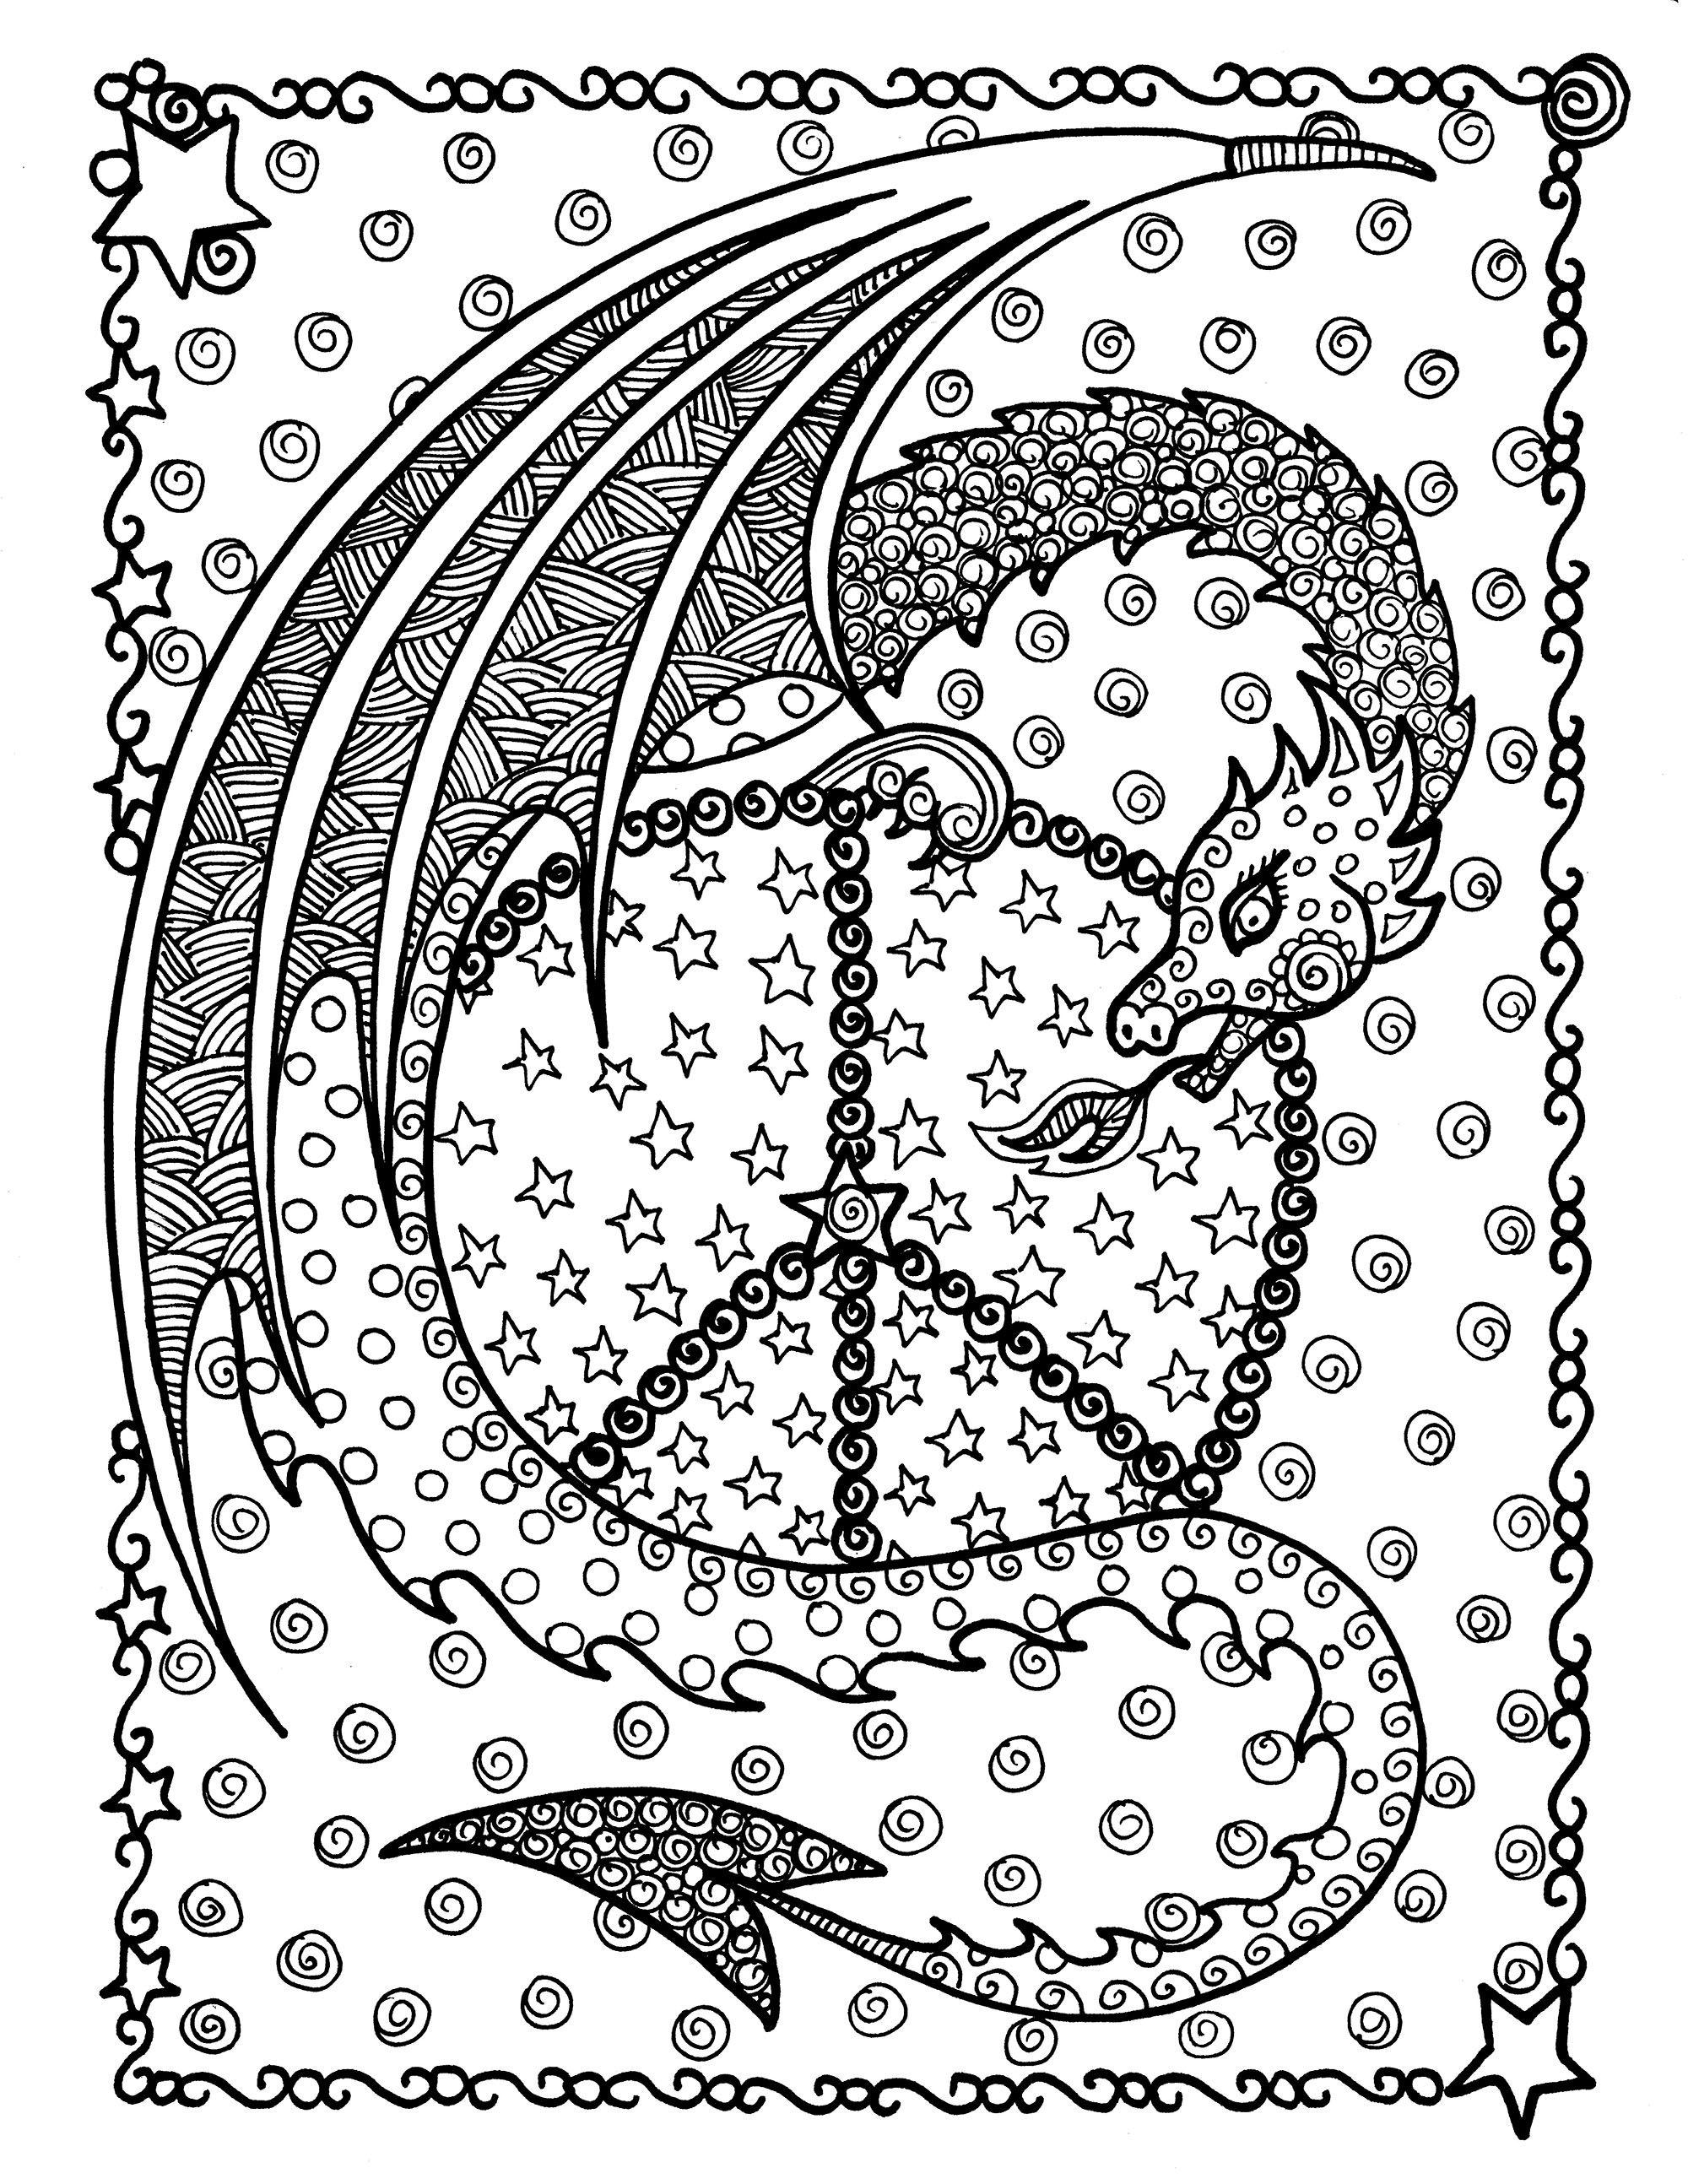 Peace dragonFrom the gallery : Myths & LegendsArtist : Deborah